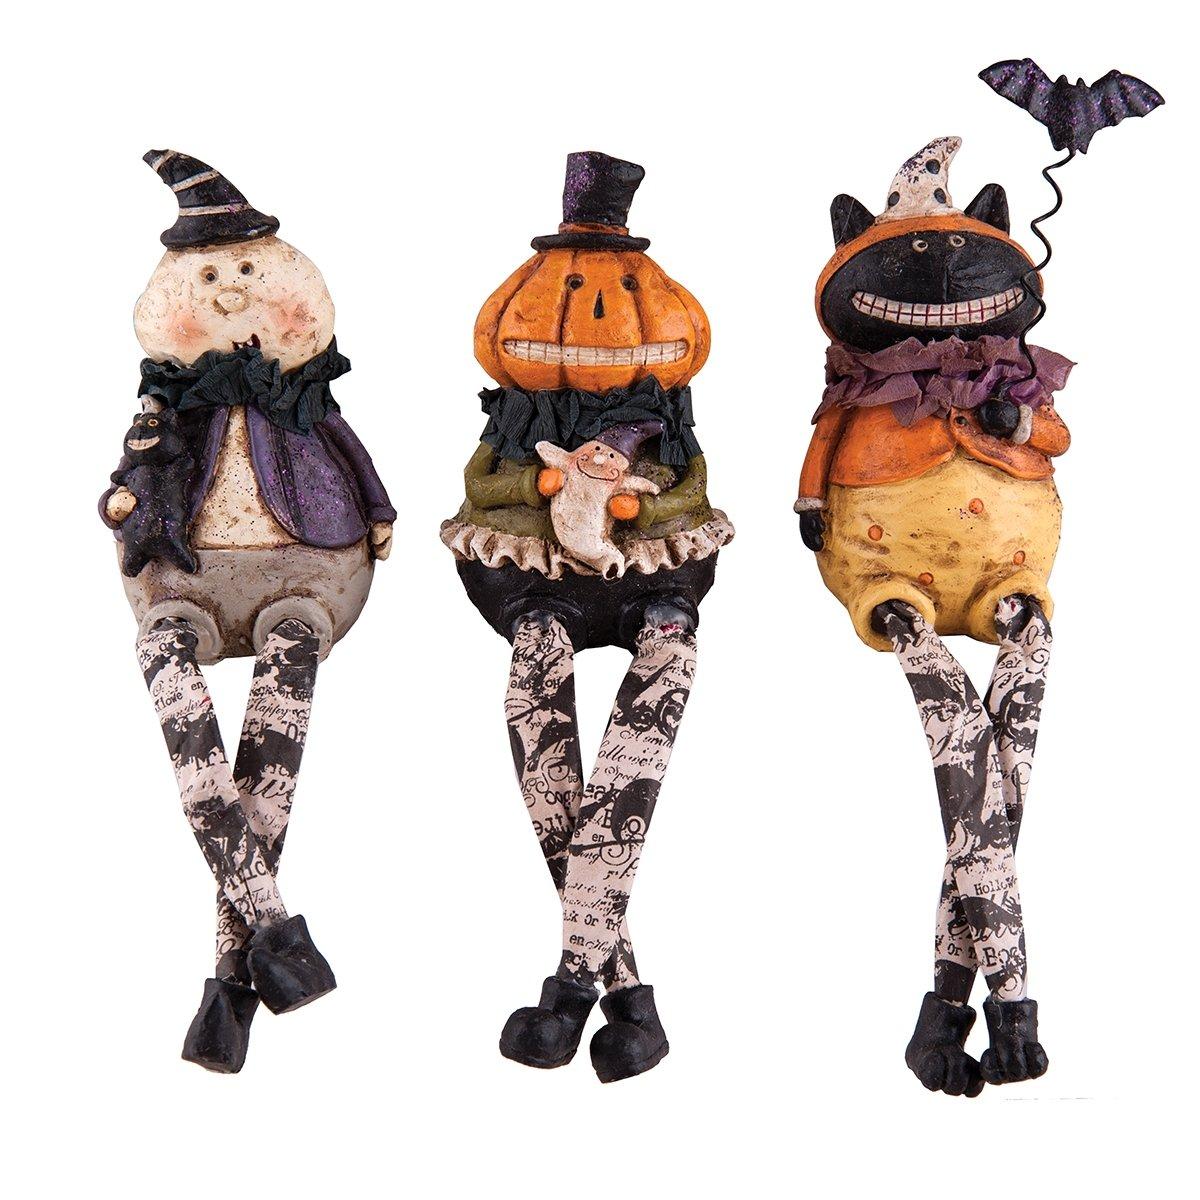 Halloween Spooky Shelf Sitter s, 6.25'', Assorted 3